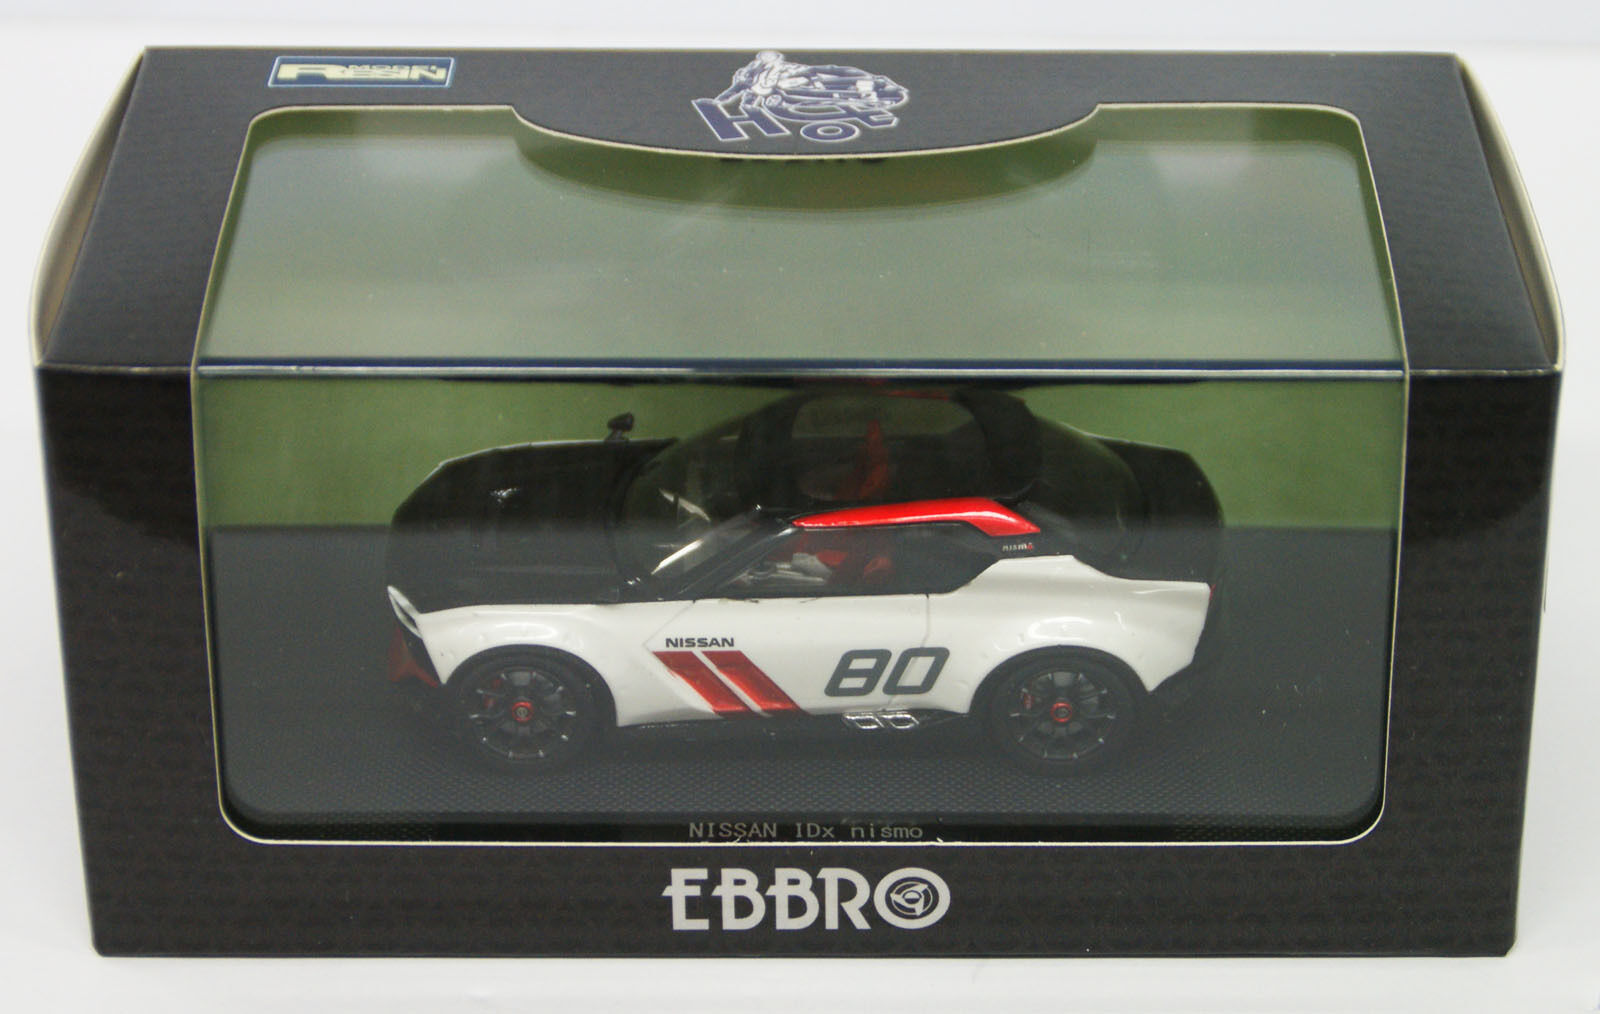 EBBRO 45038 Nissan IDX Nismo Noir Blanc échelle 1 43